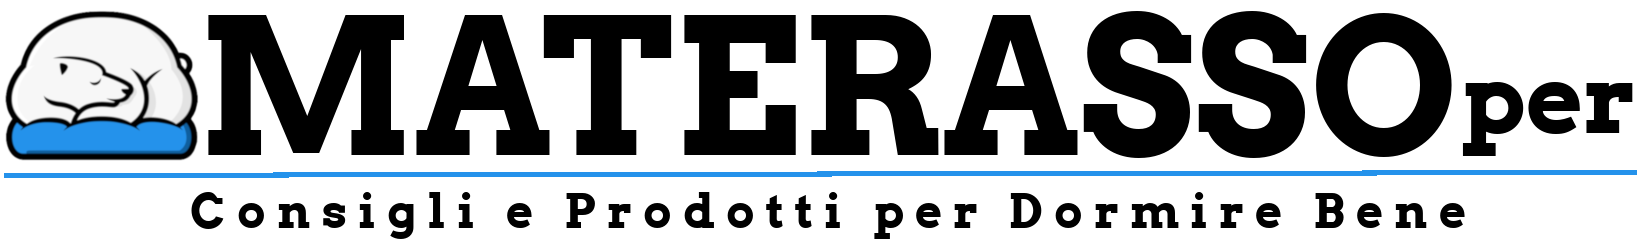 logo materassiper